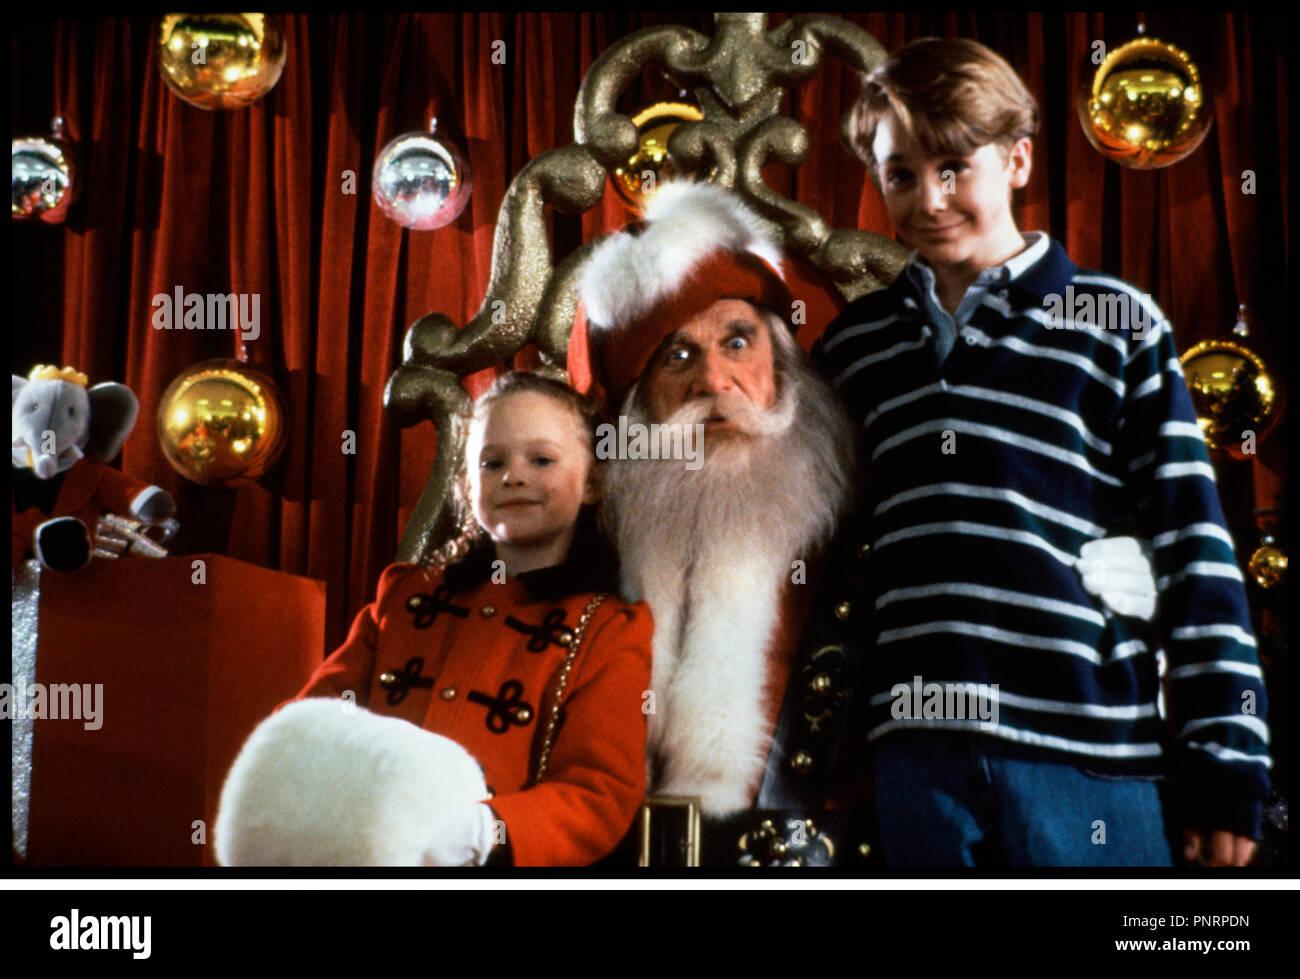 prod db paramount dr le plus beau cadeau du monde all i - All I Want For Christmas 1991